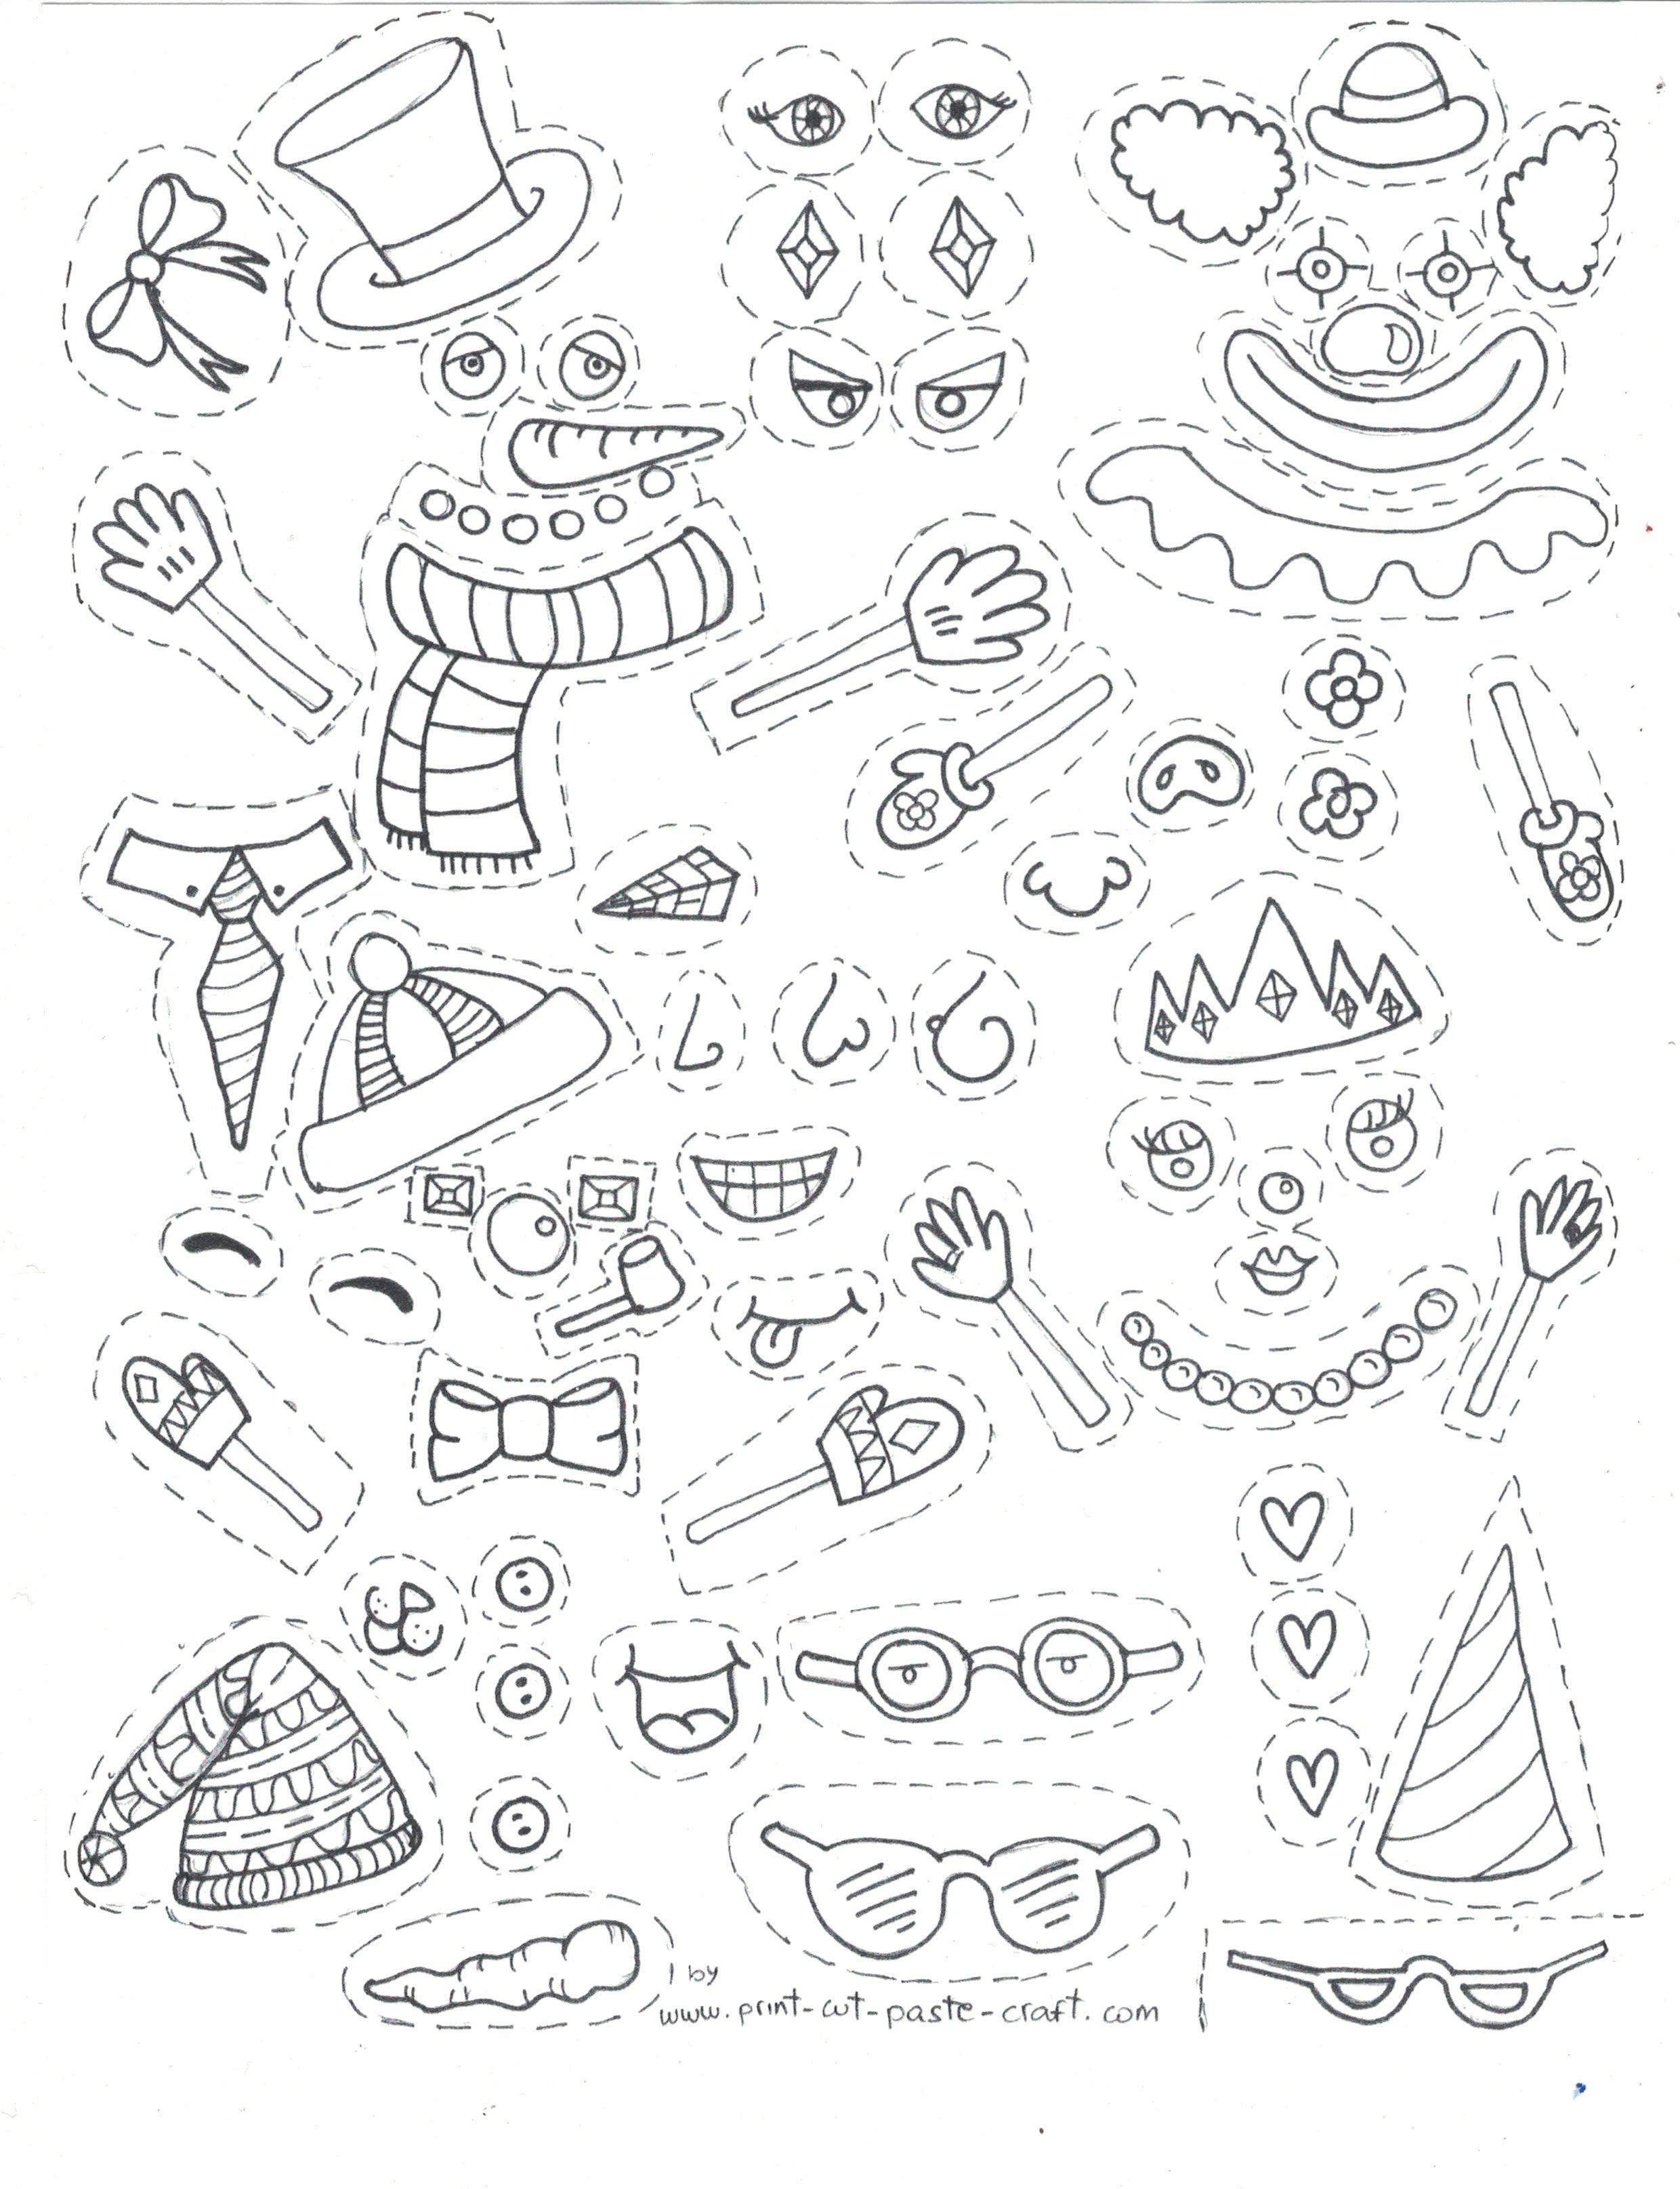 print cut paste craft blog archive free printable kids